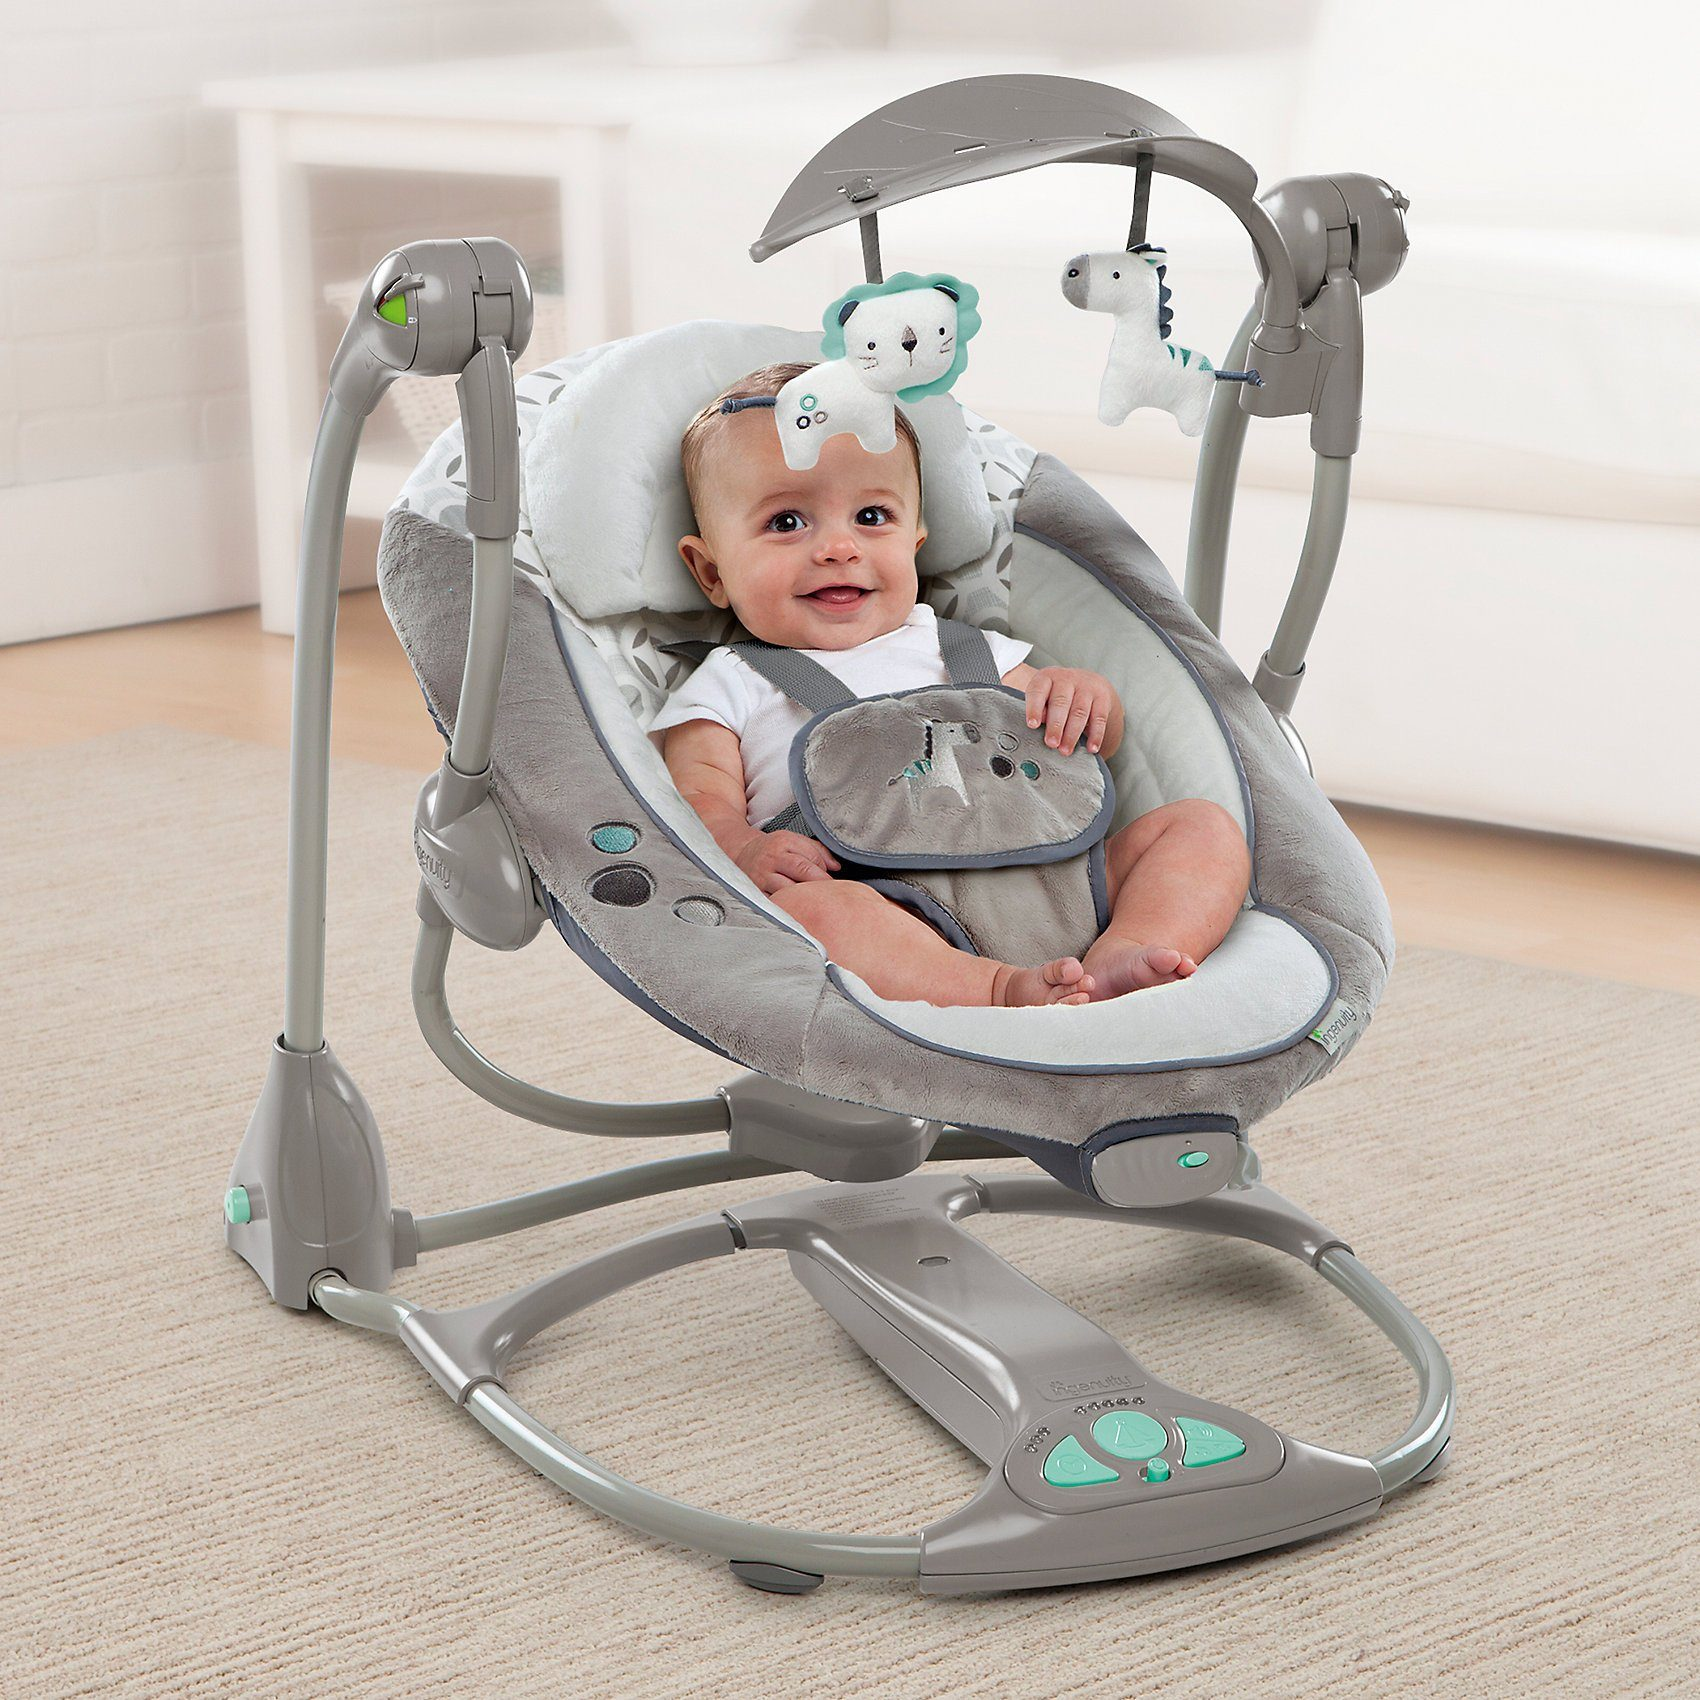 Babyschaukel Swing-2-Seat, Orson